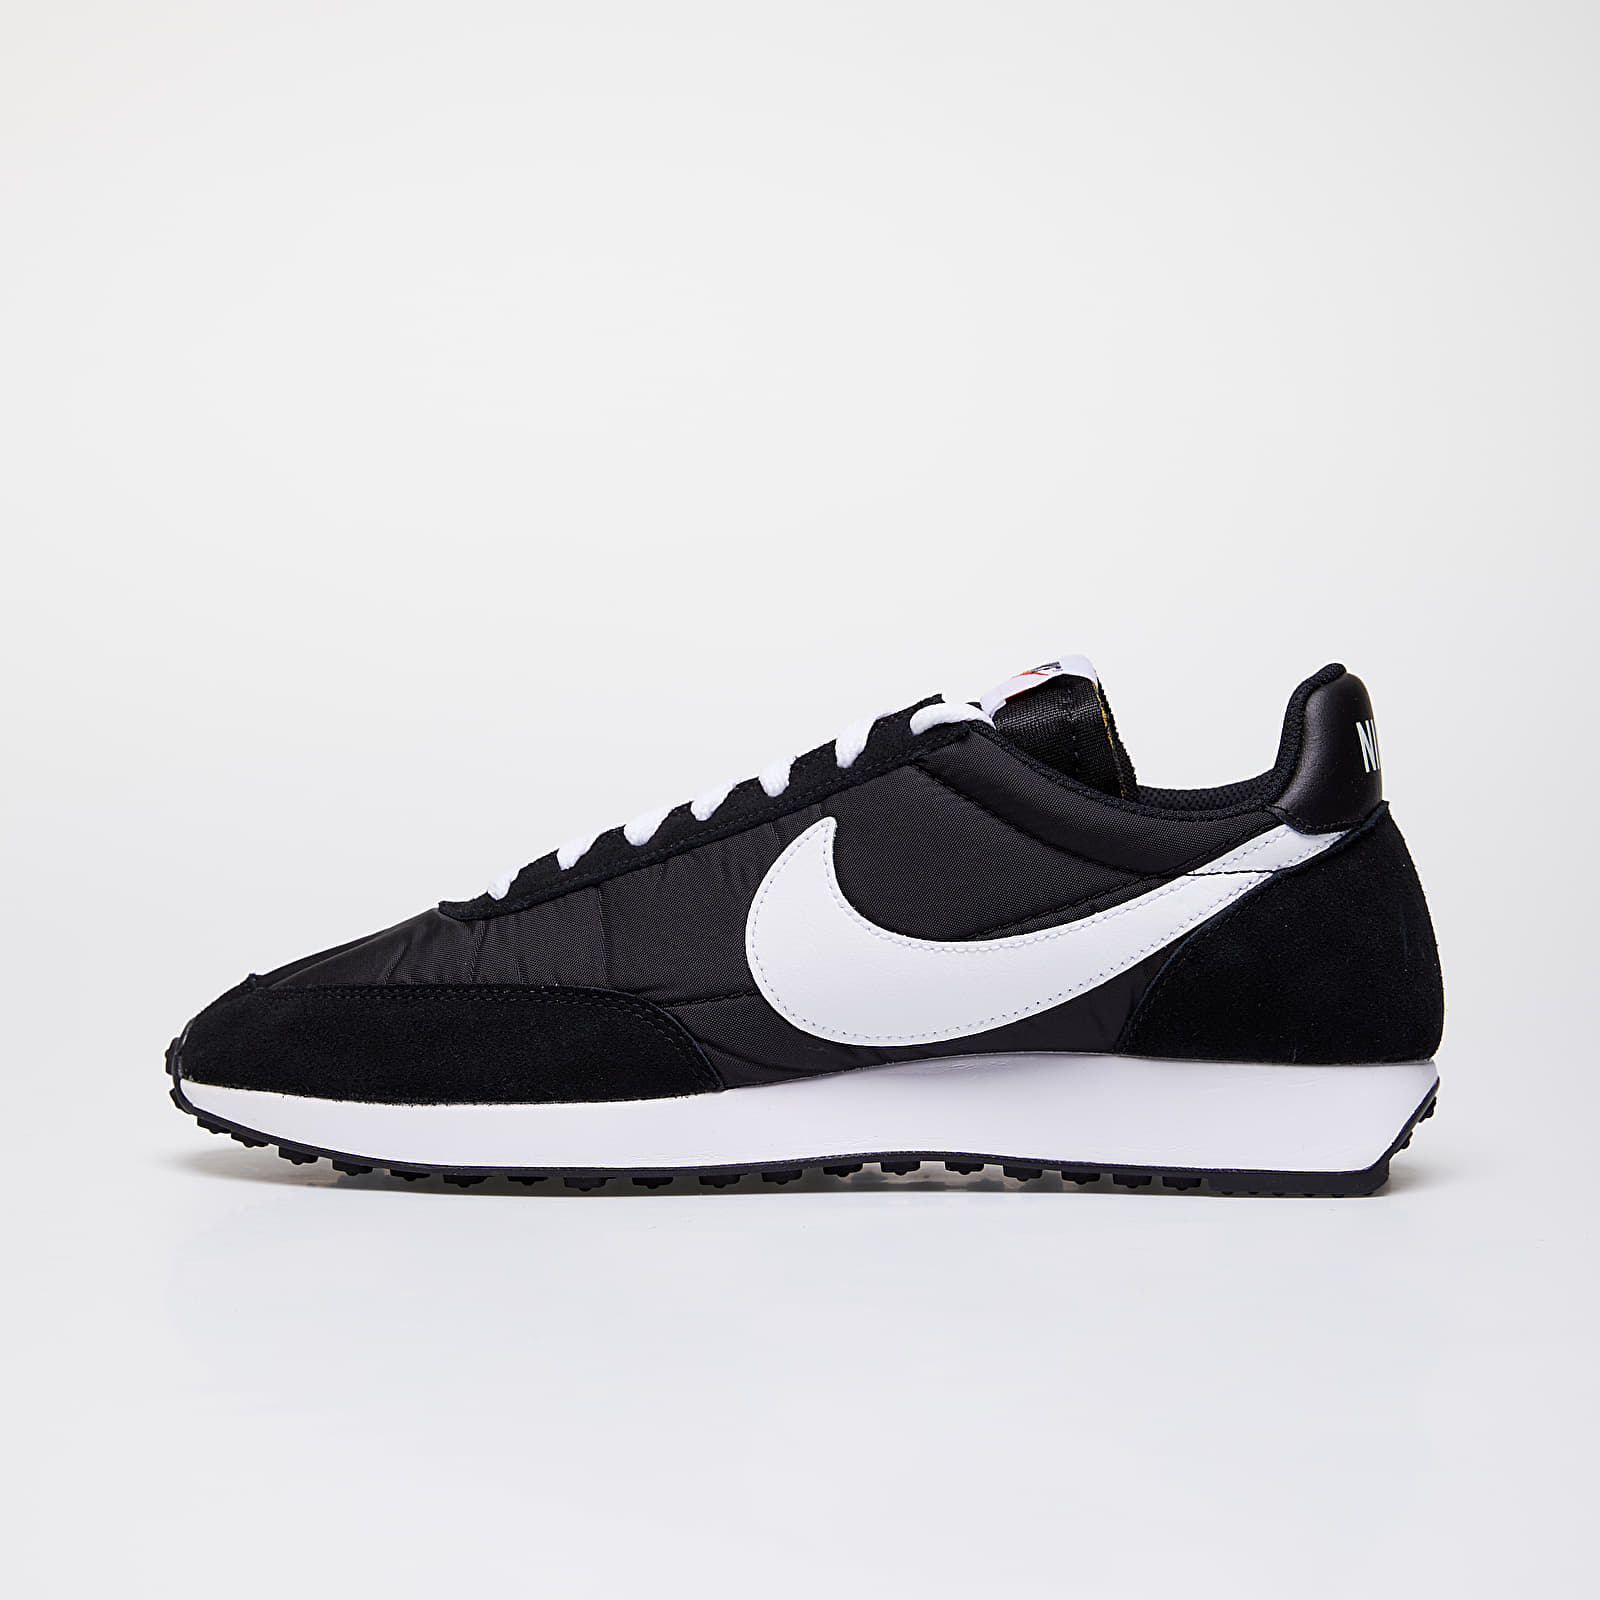 Men's shoes Nike Air Tailwind 79 Black/ White-Team Orange